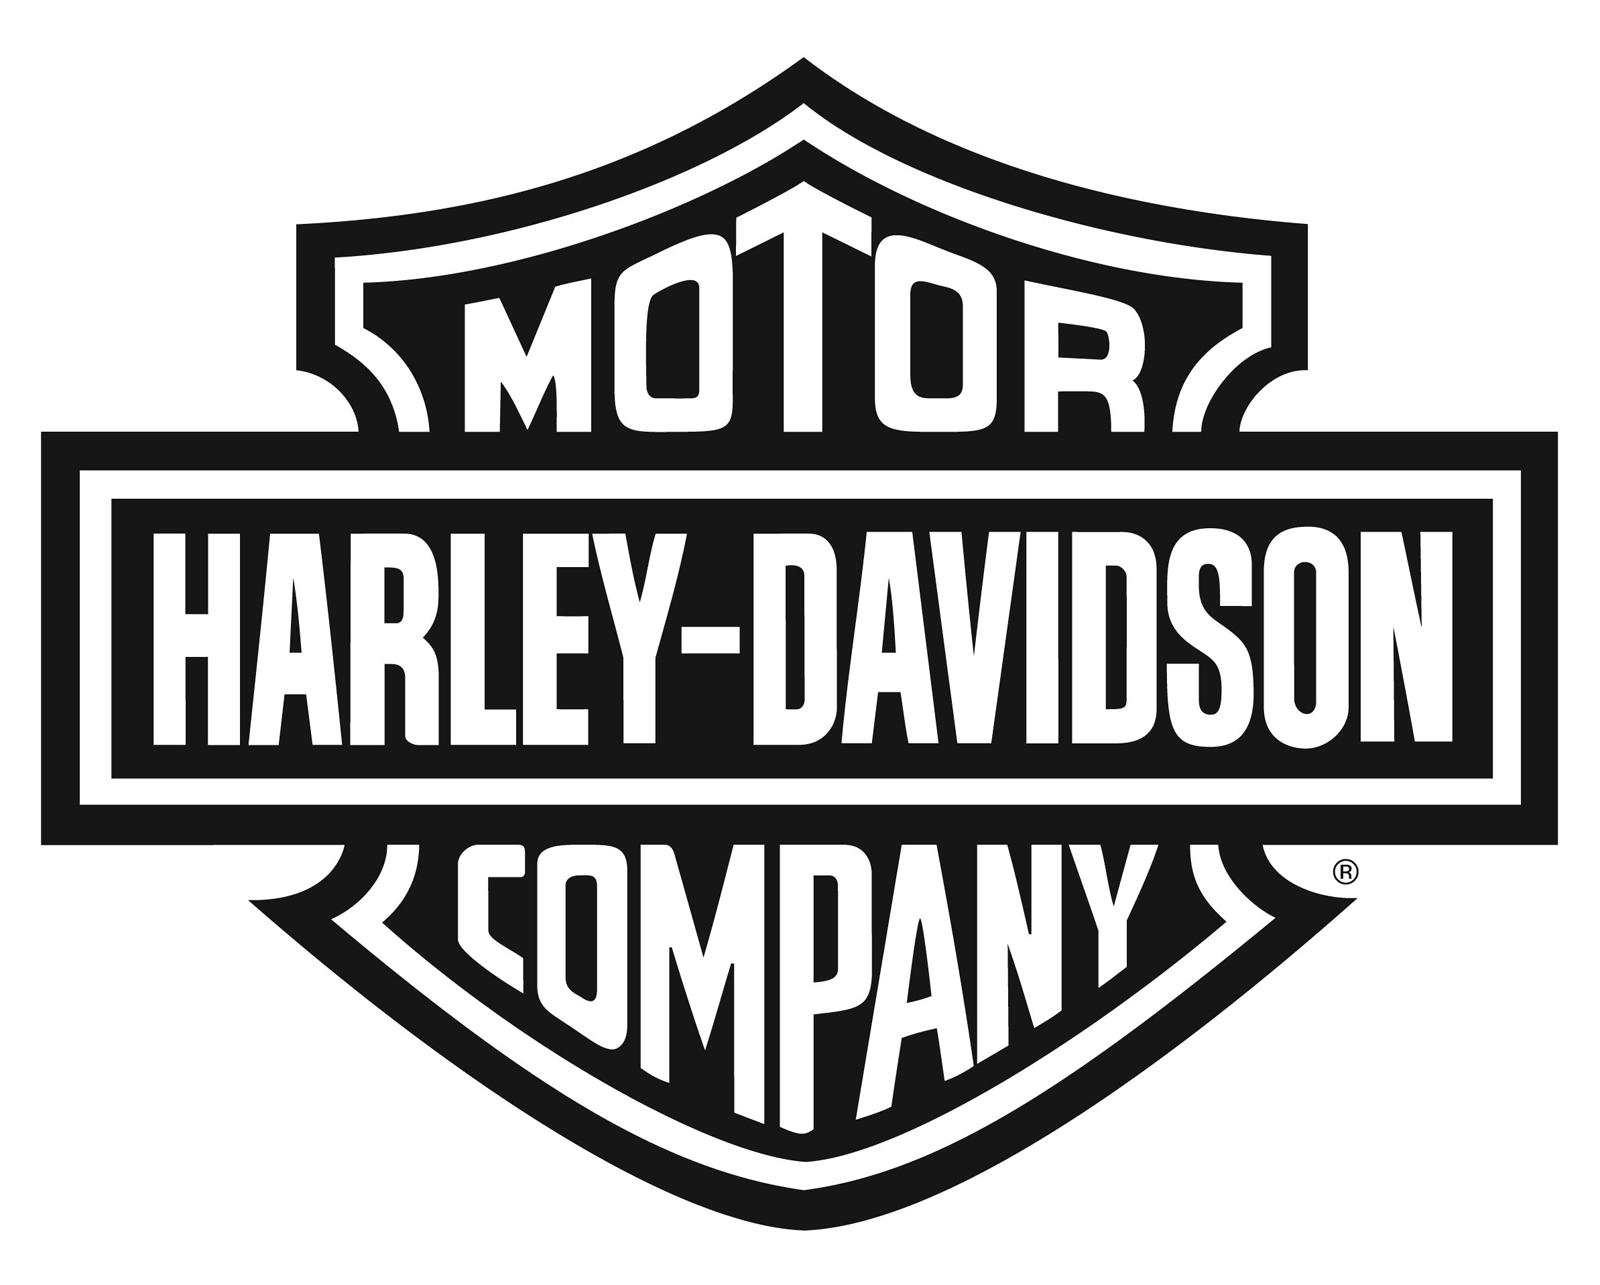 Le logo moto harley davidson embleme sigle lancia - Sigle harley davidson ...